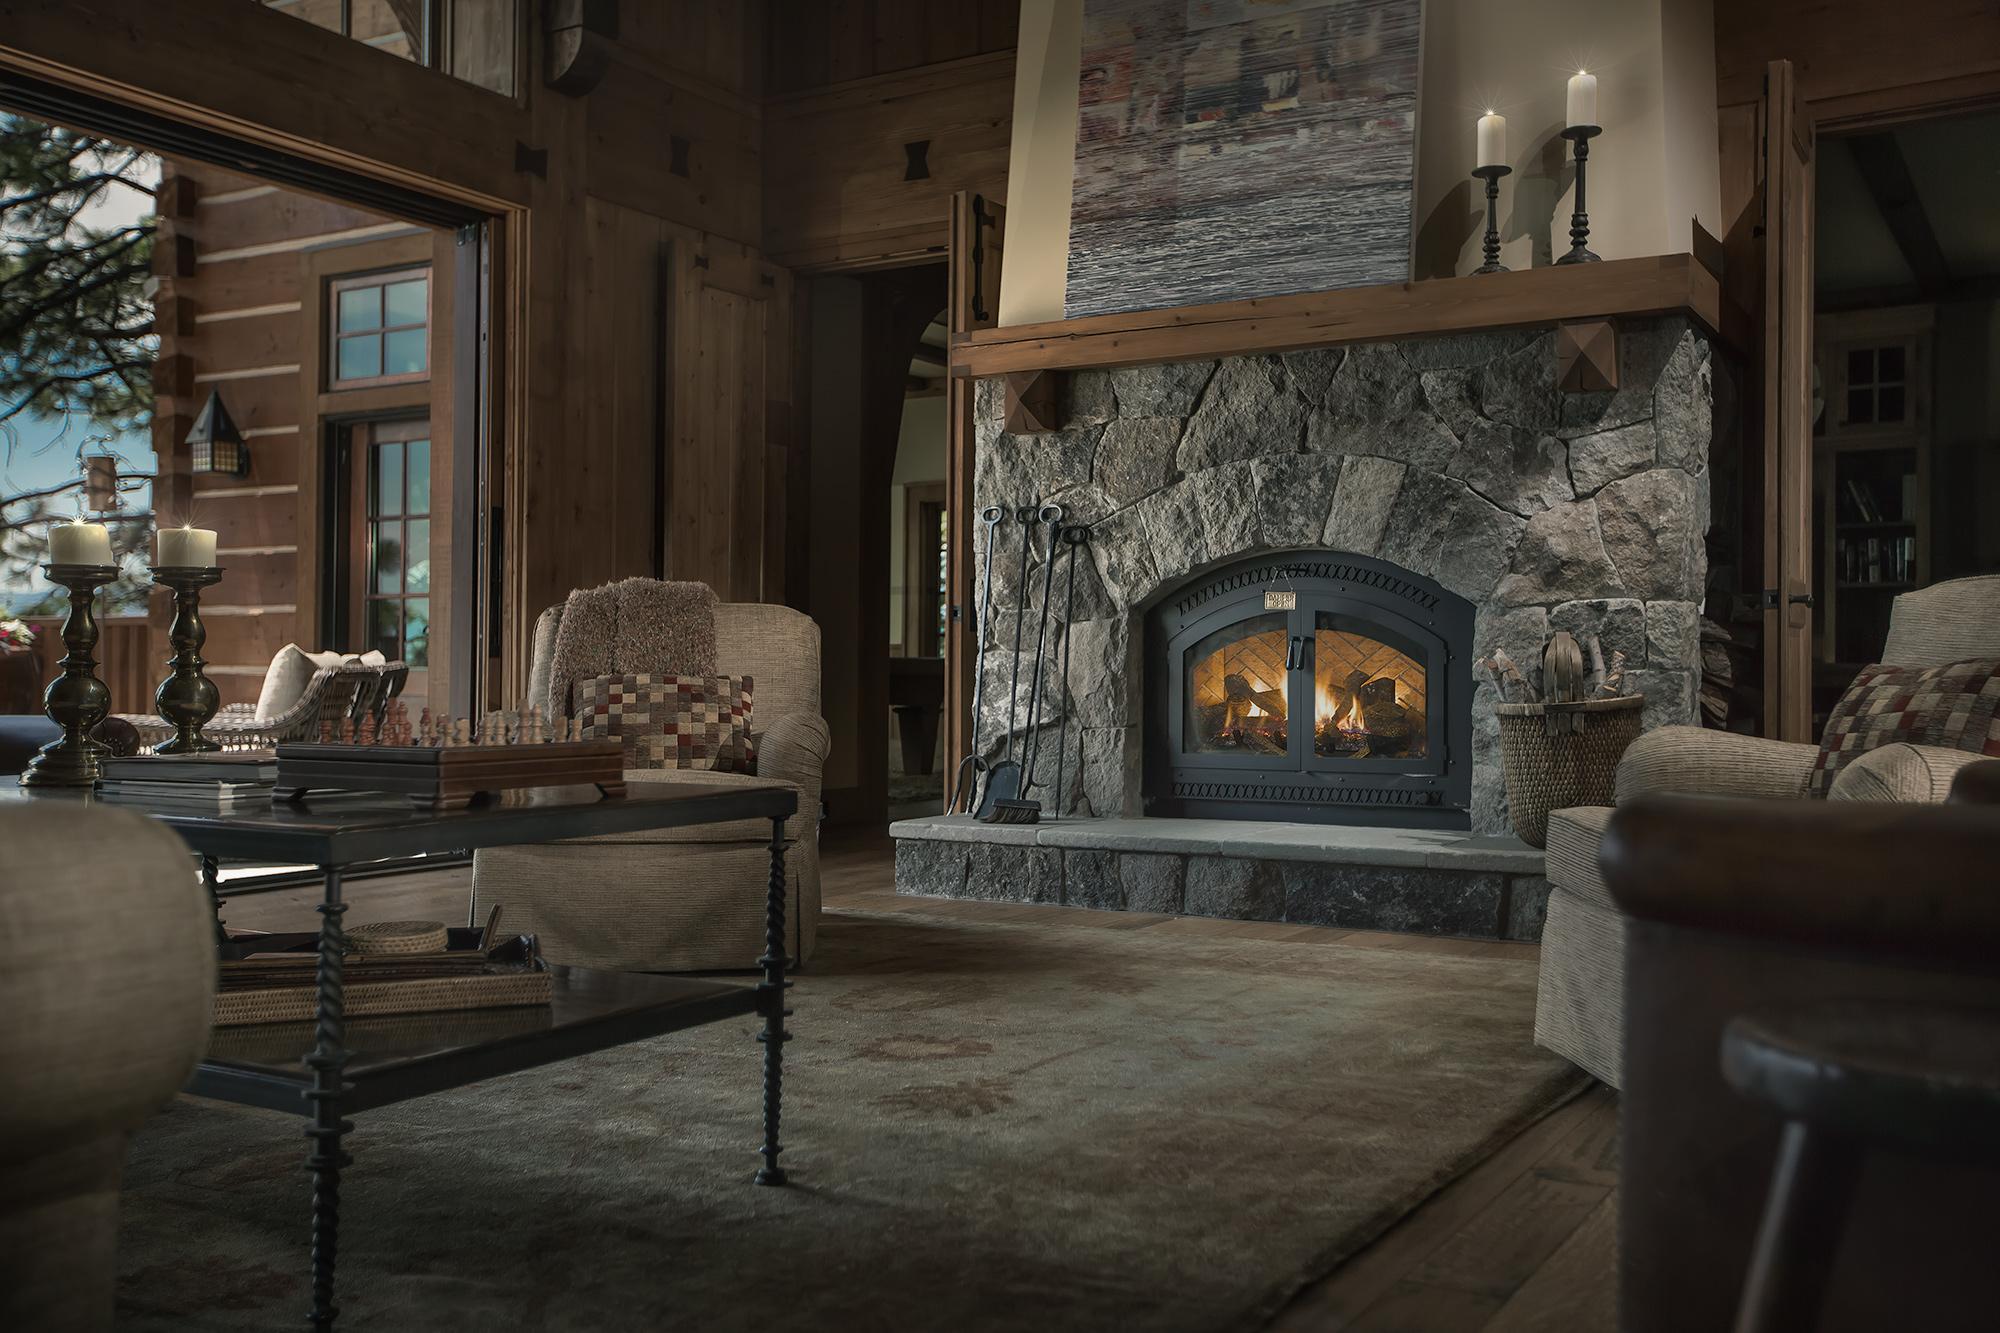 tahoe-residence-fireplace.jpg